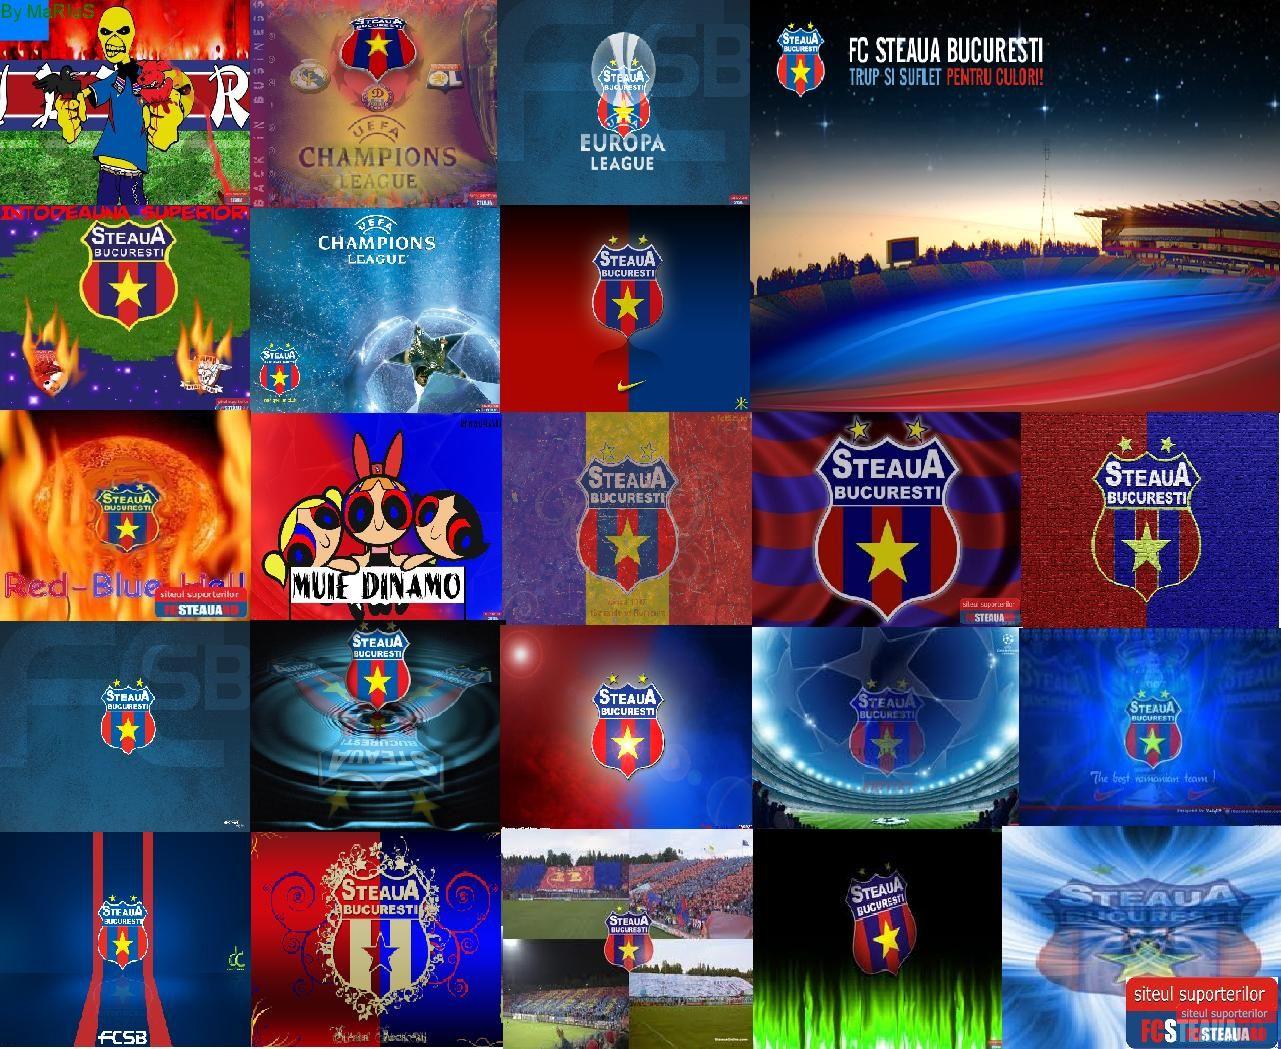 Poza Steaua Bucuresti Www Fcsteaua Pictures